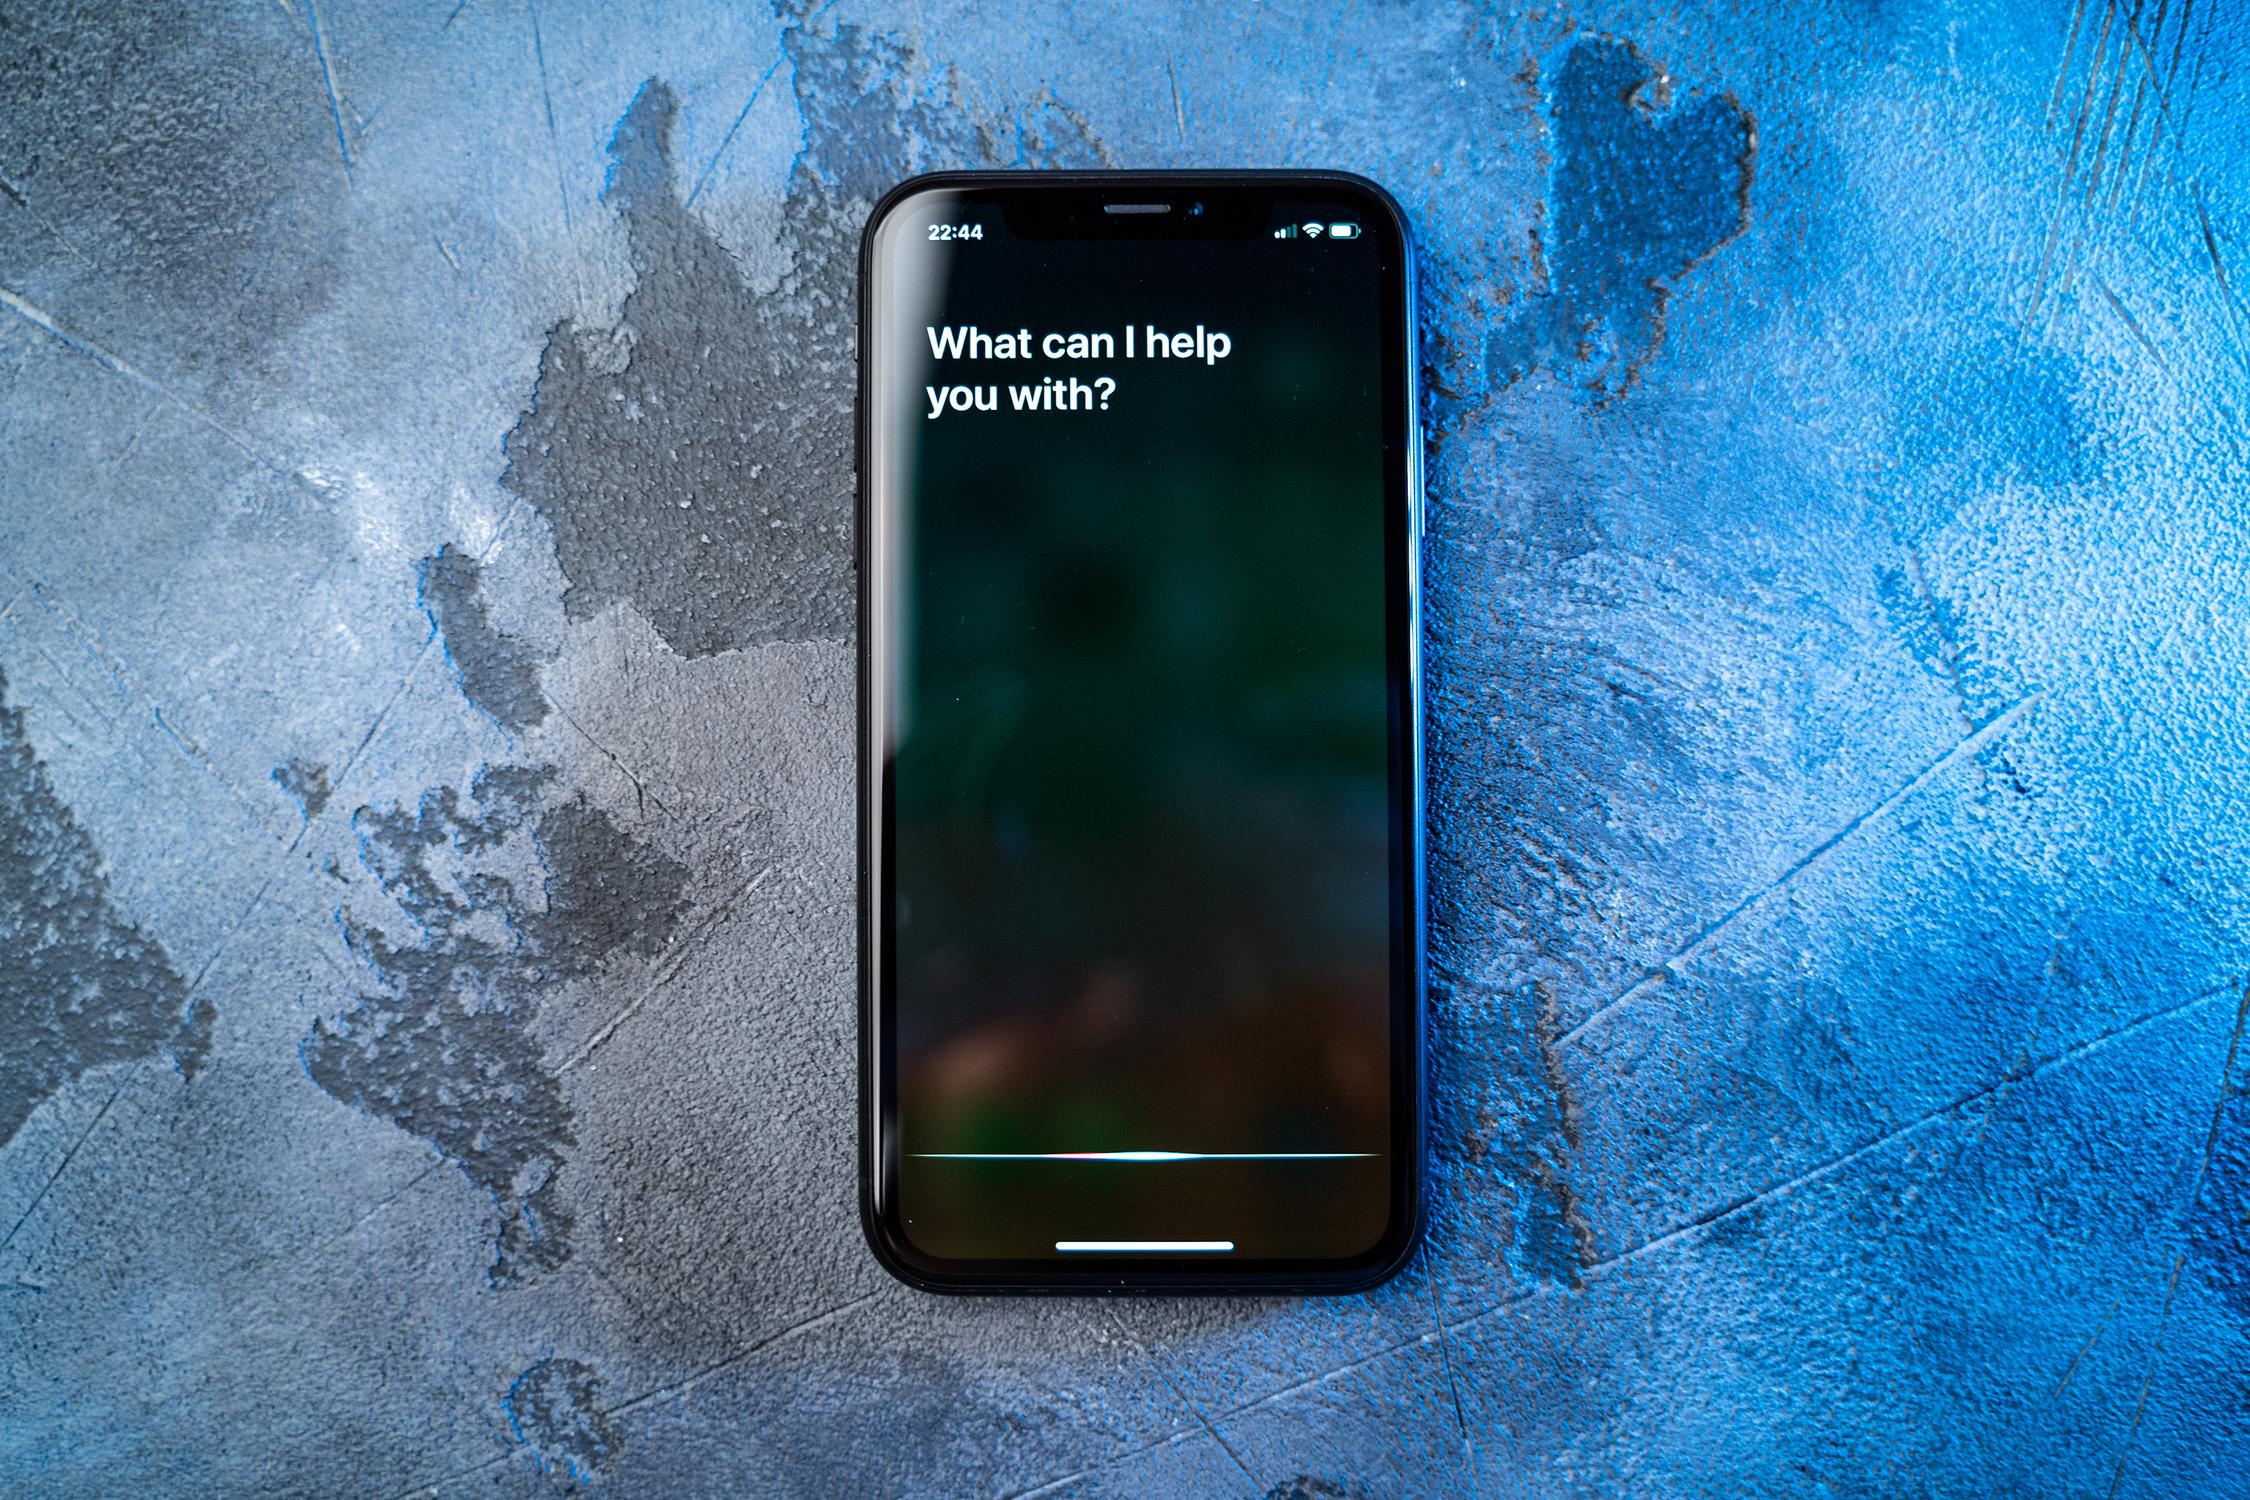 Mobile phone - Siri